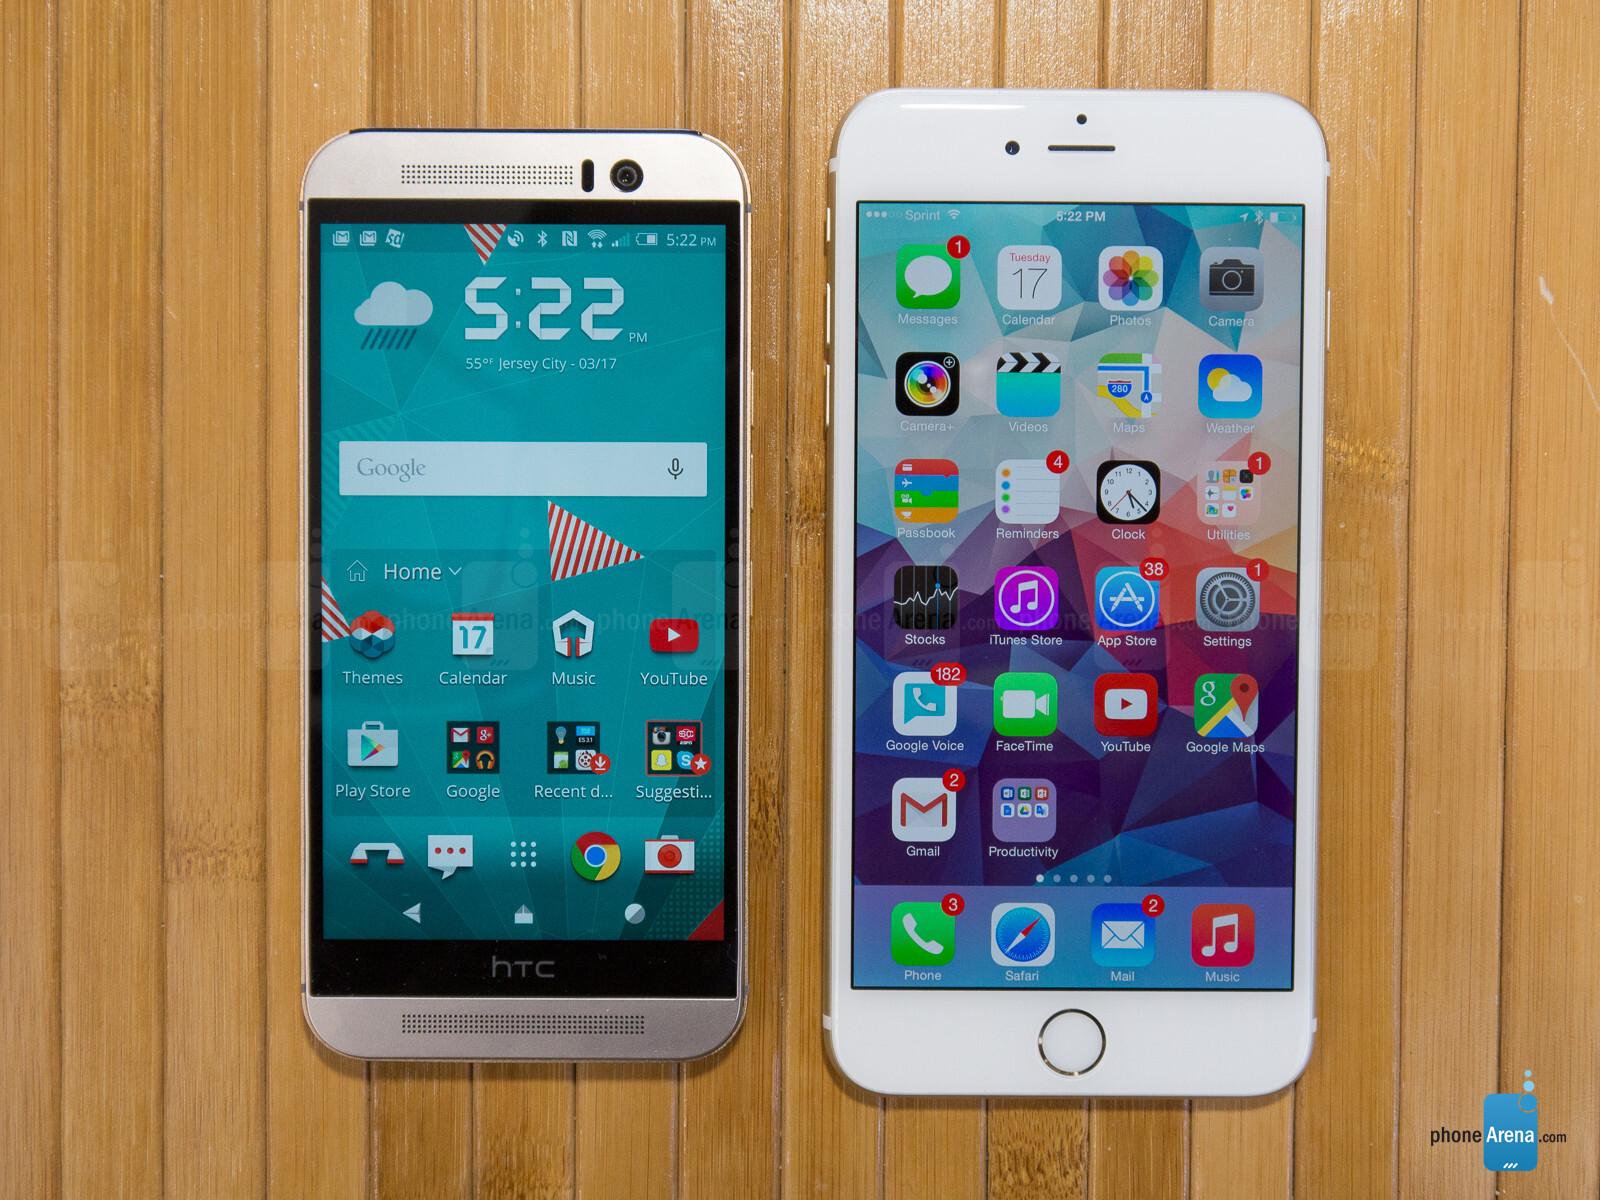 Samsung galaxy note 5 vs htc one m9 plus a comparison - Samsung Galaxy Note 5 Vs Htc One M9 Plus A Comparison 33